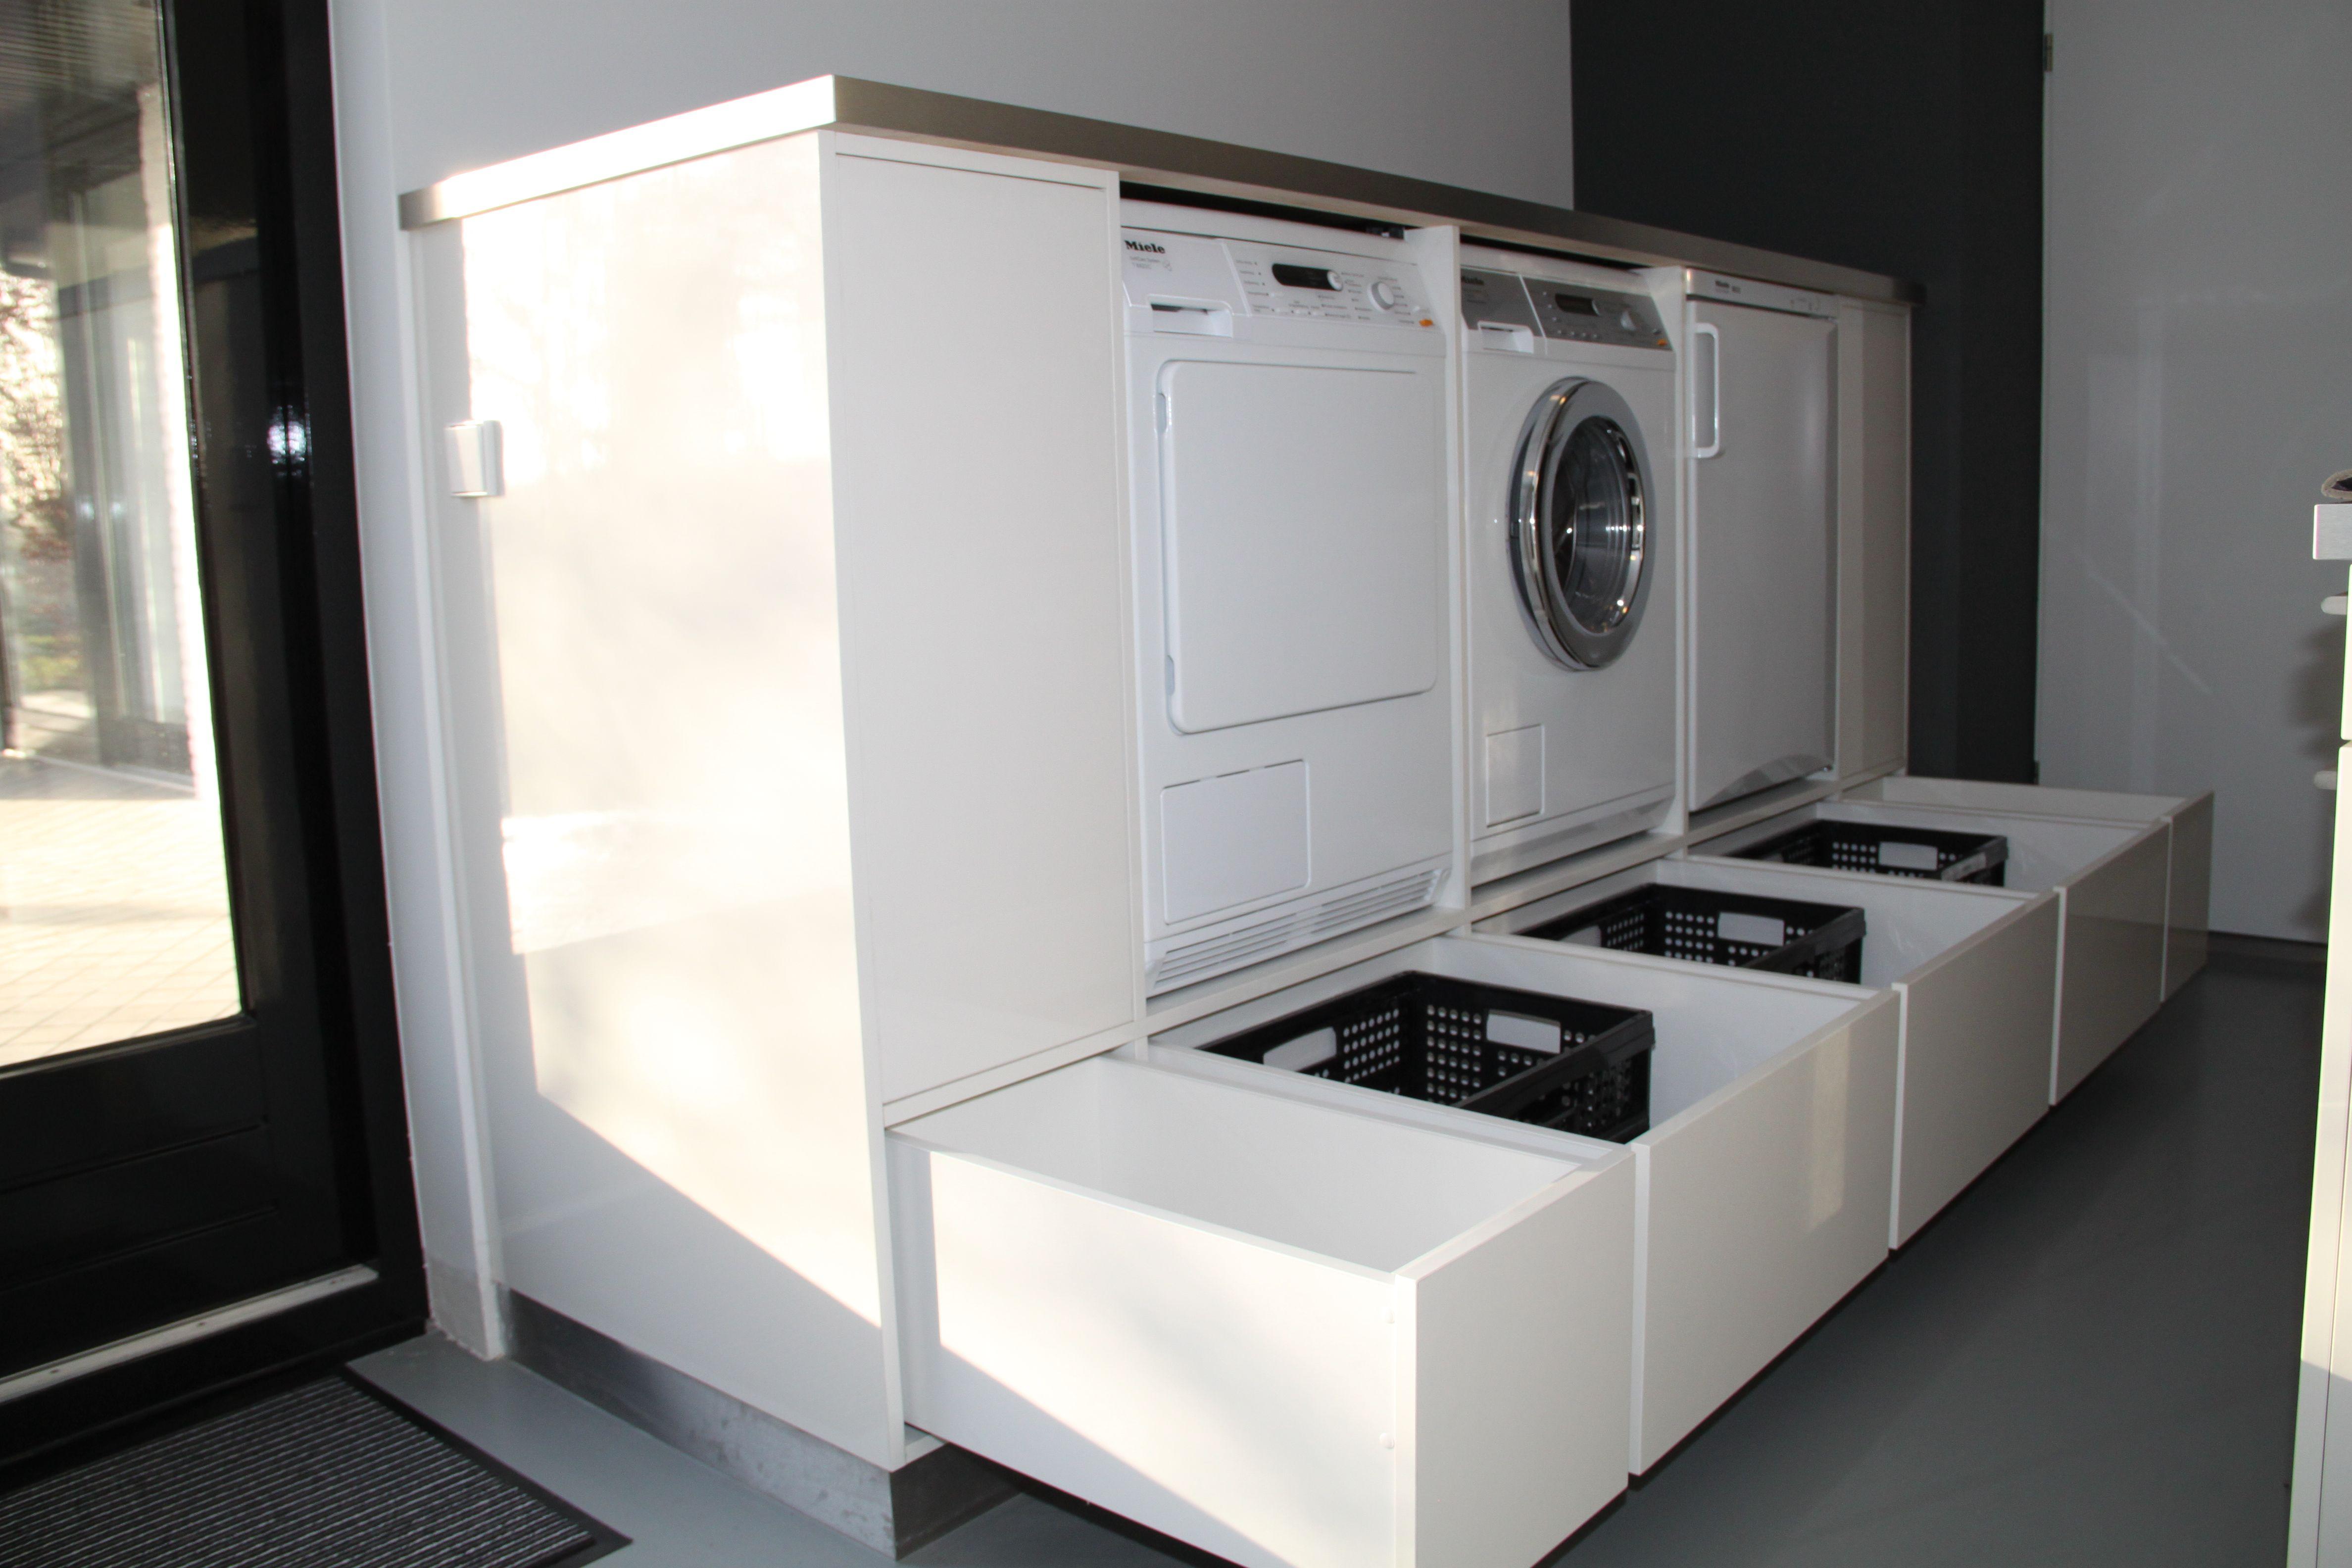 Kast Wasmachine Droger : Wasmachine kast google zoeken interieur